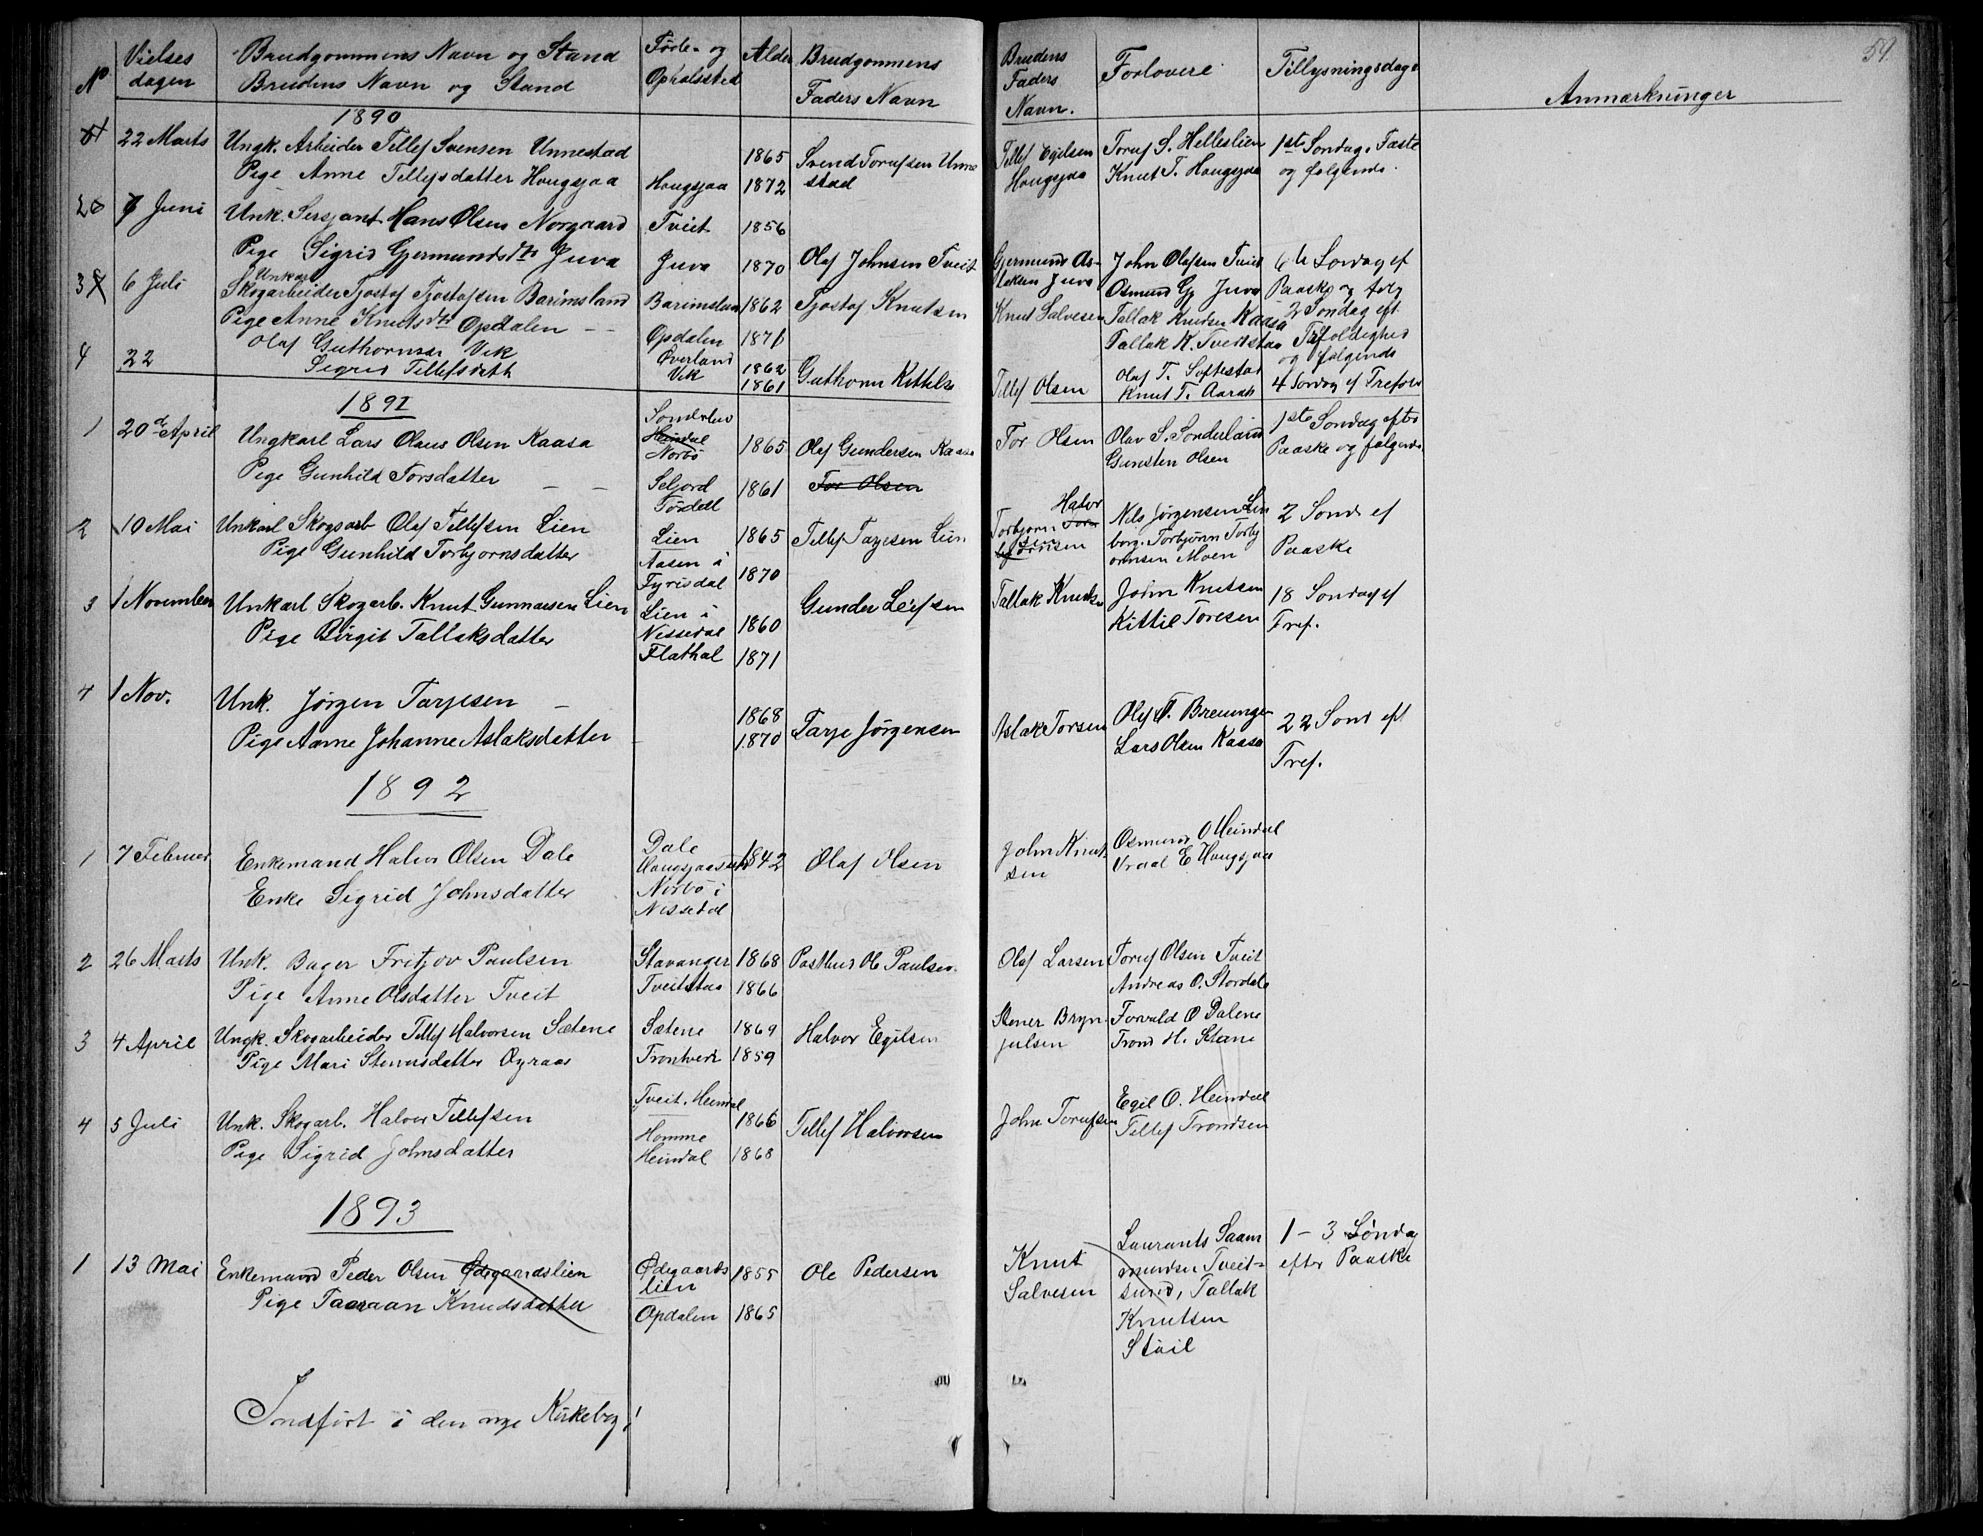 SAKO, Nissedal kirkebøker, G/Gb/L0002: Klokkerbok nr. II 2, 1863-1892, s. 59